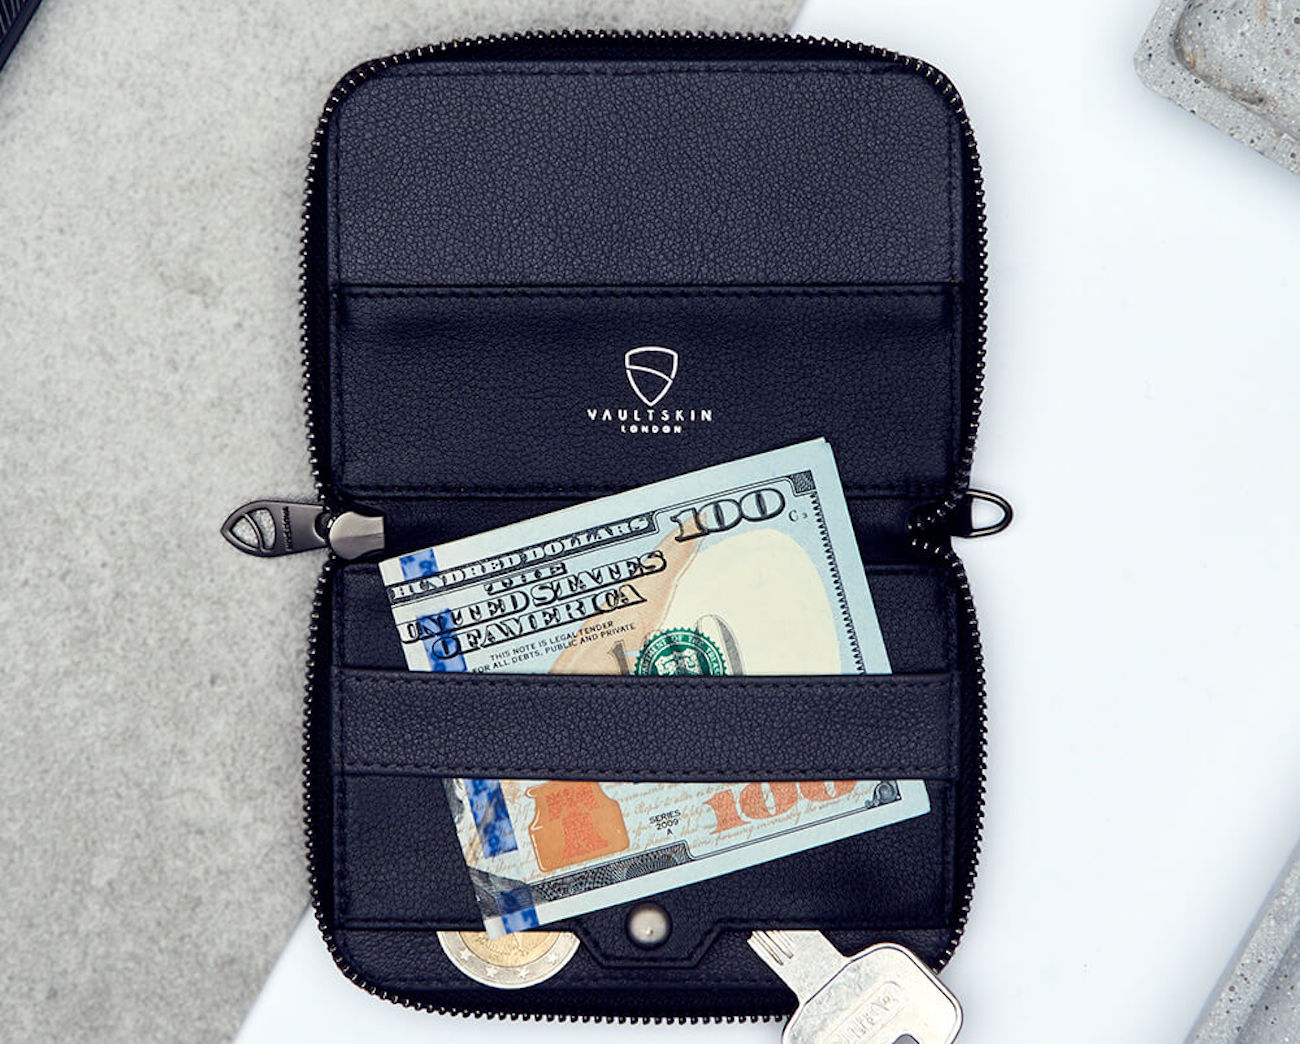 Vaultskin NOTTING HILL Multipurpose Zip Wallet